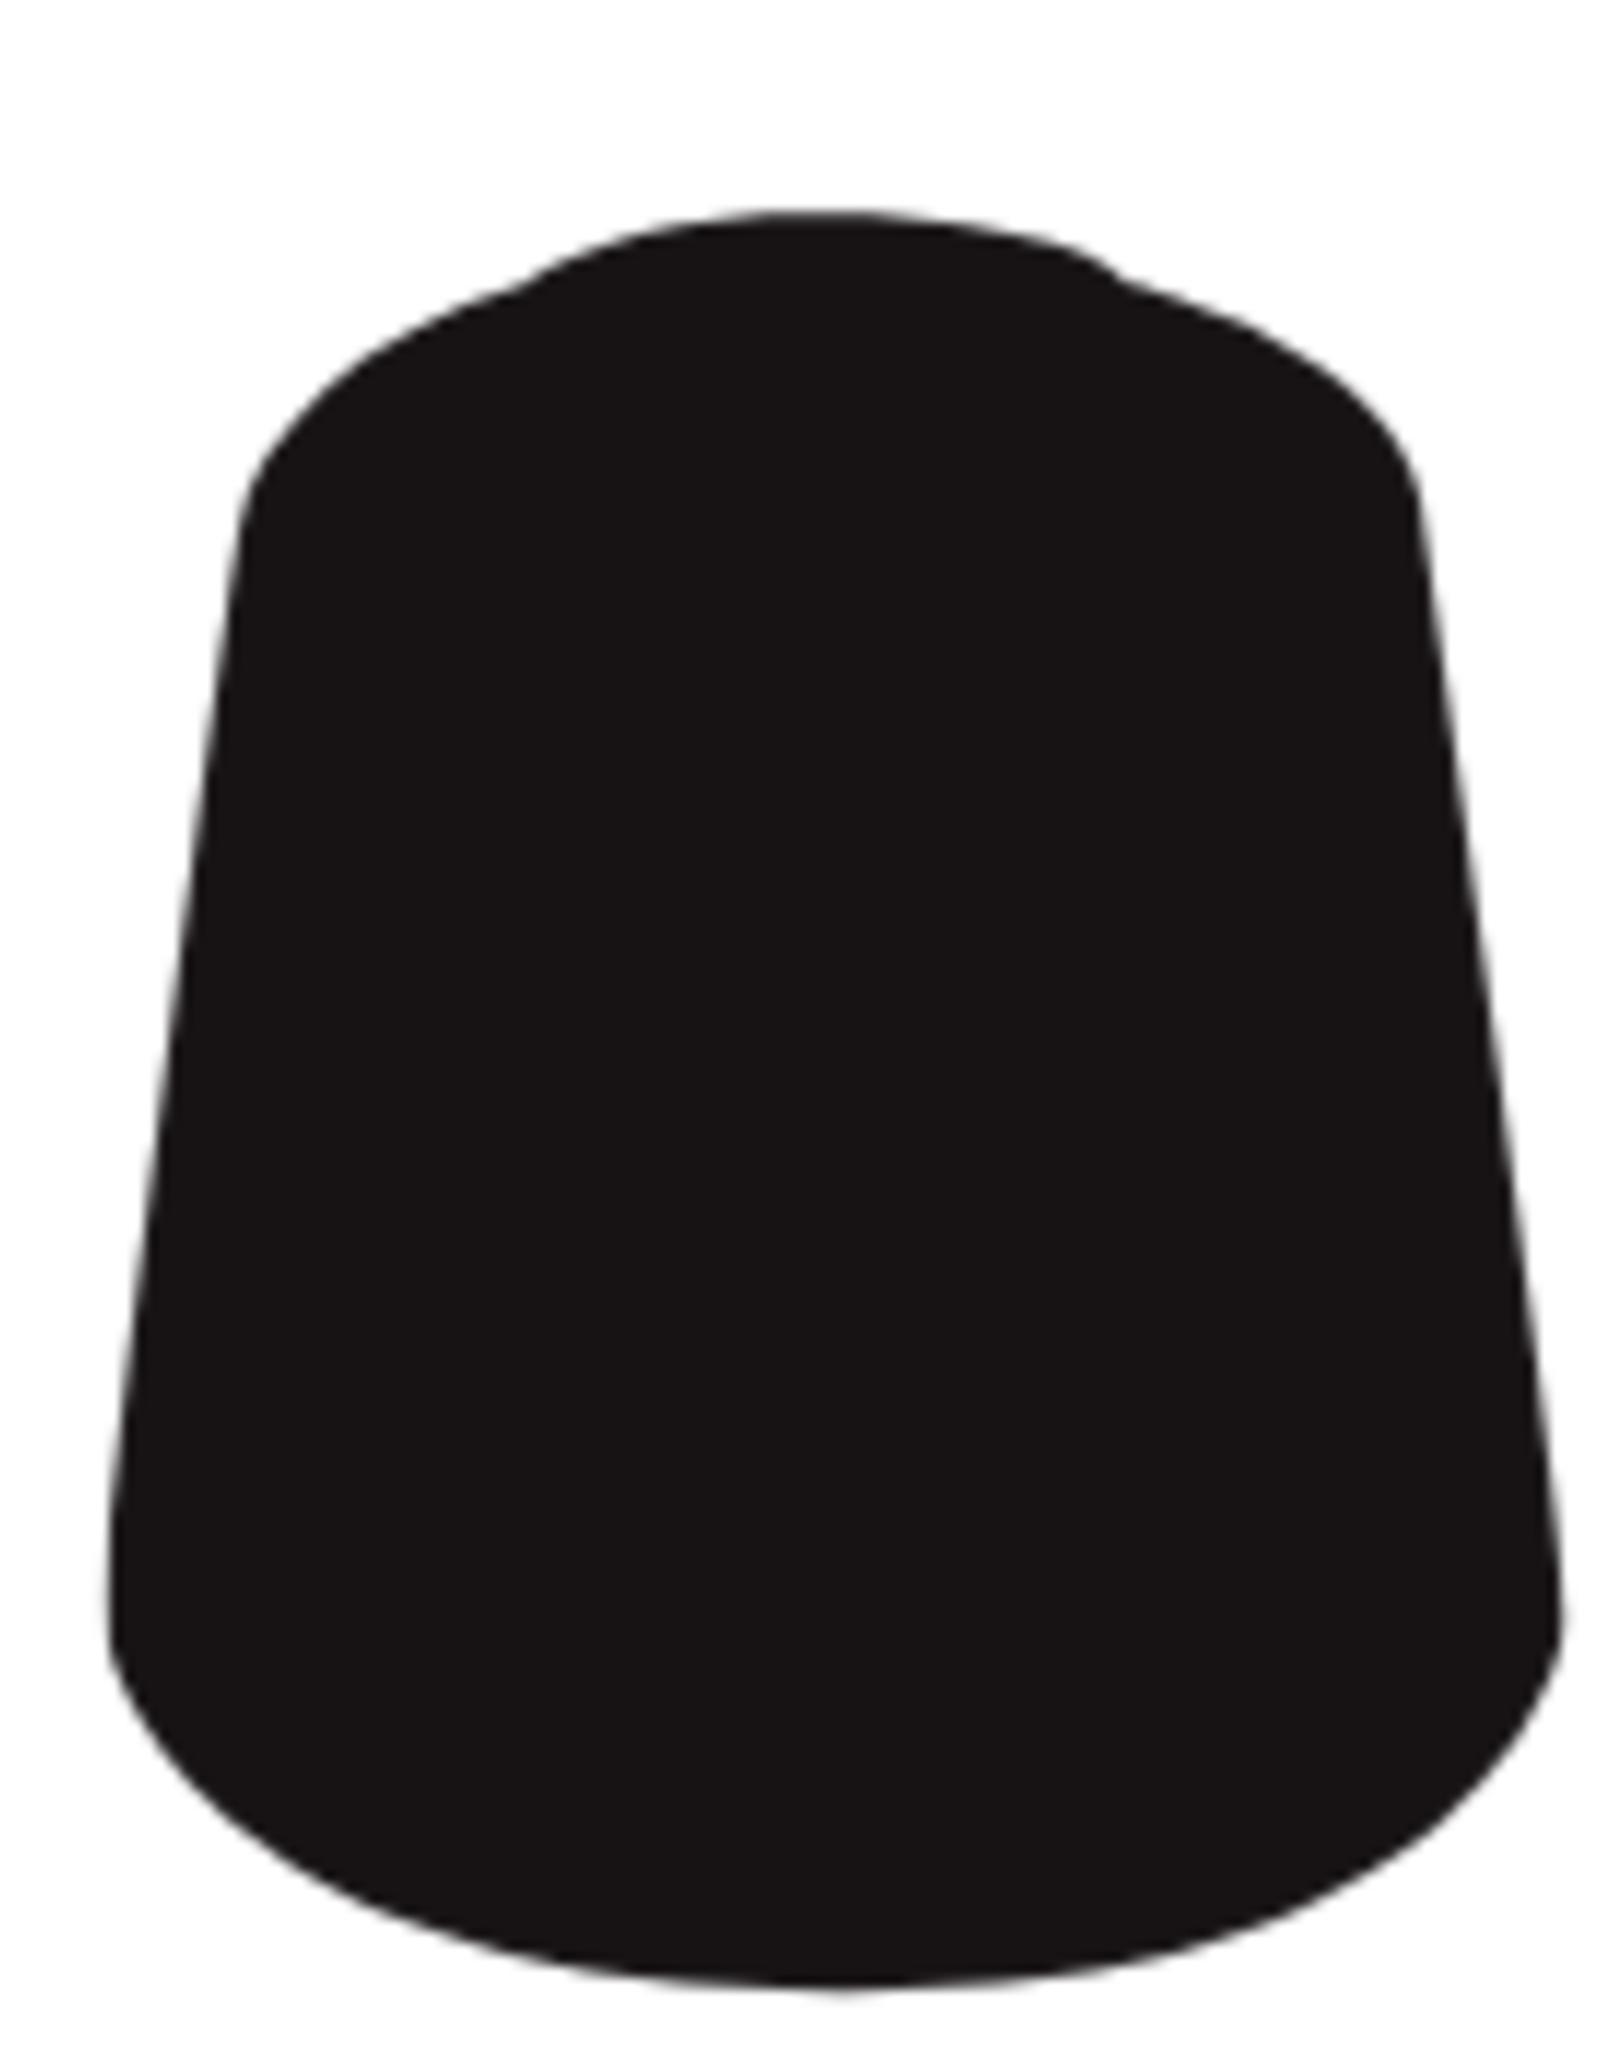 Games Workshop Base: Corvus Black (12ML) Paint